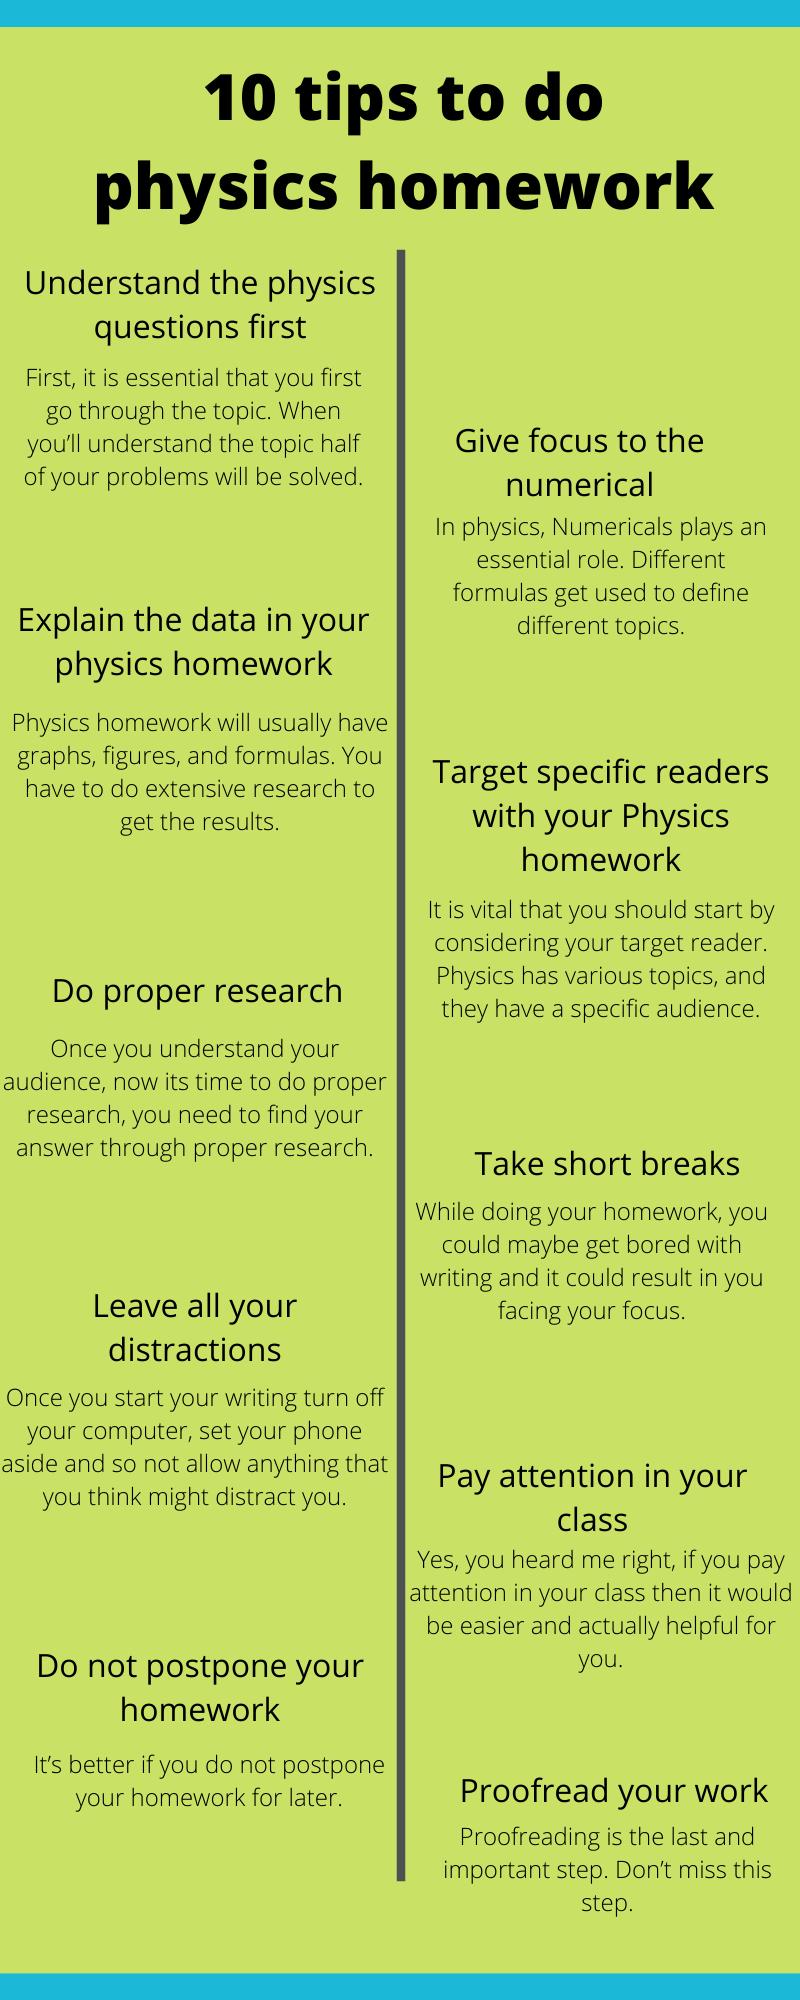 Tips-to-do-physics-homework